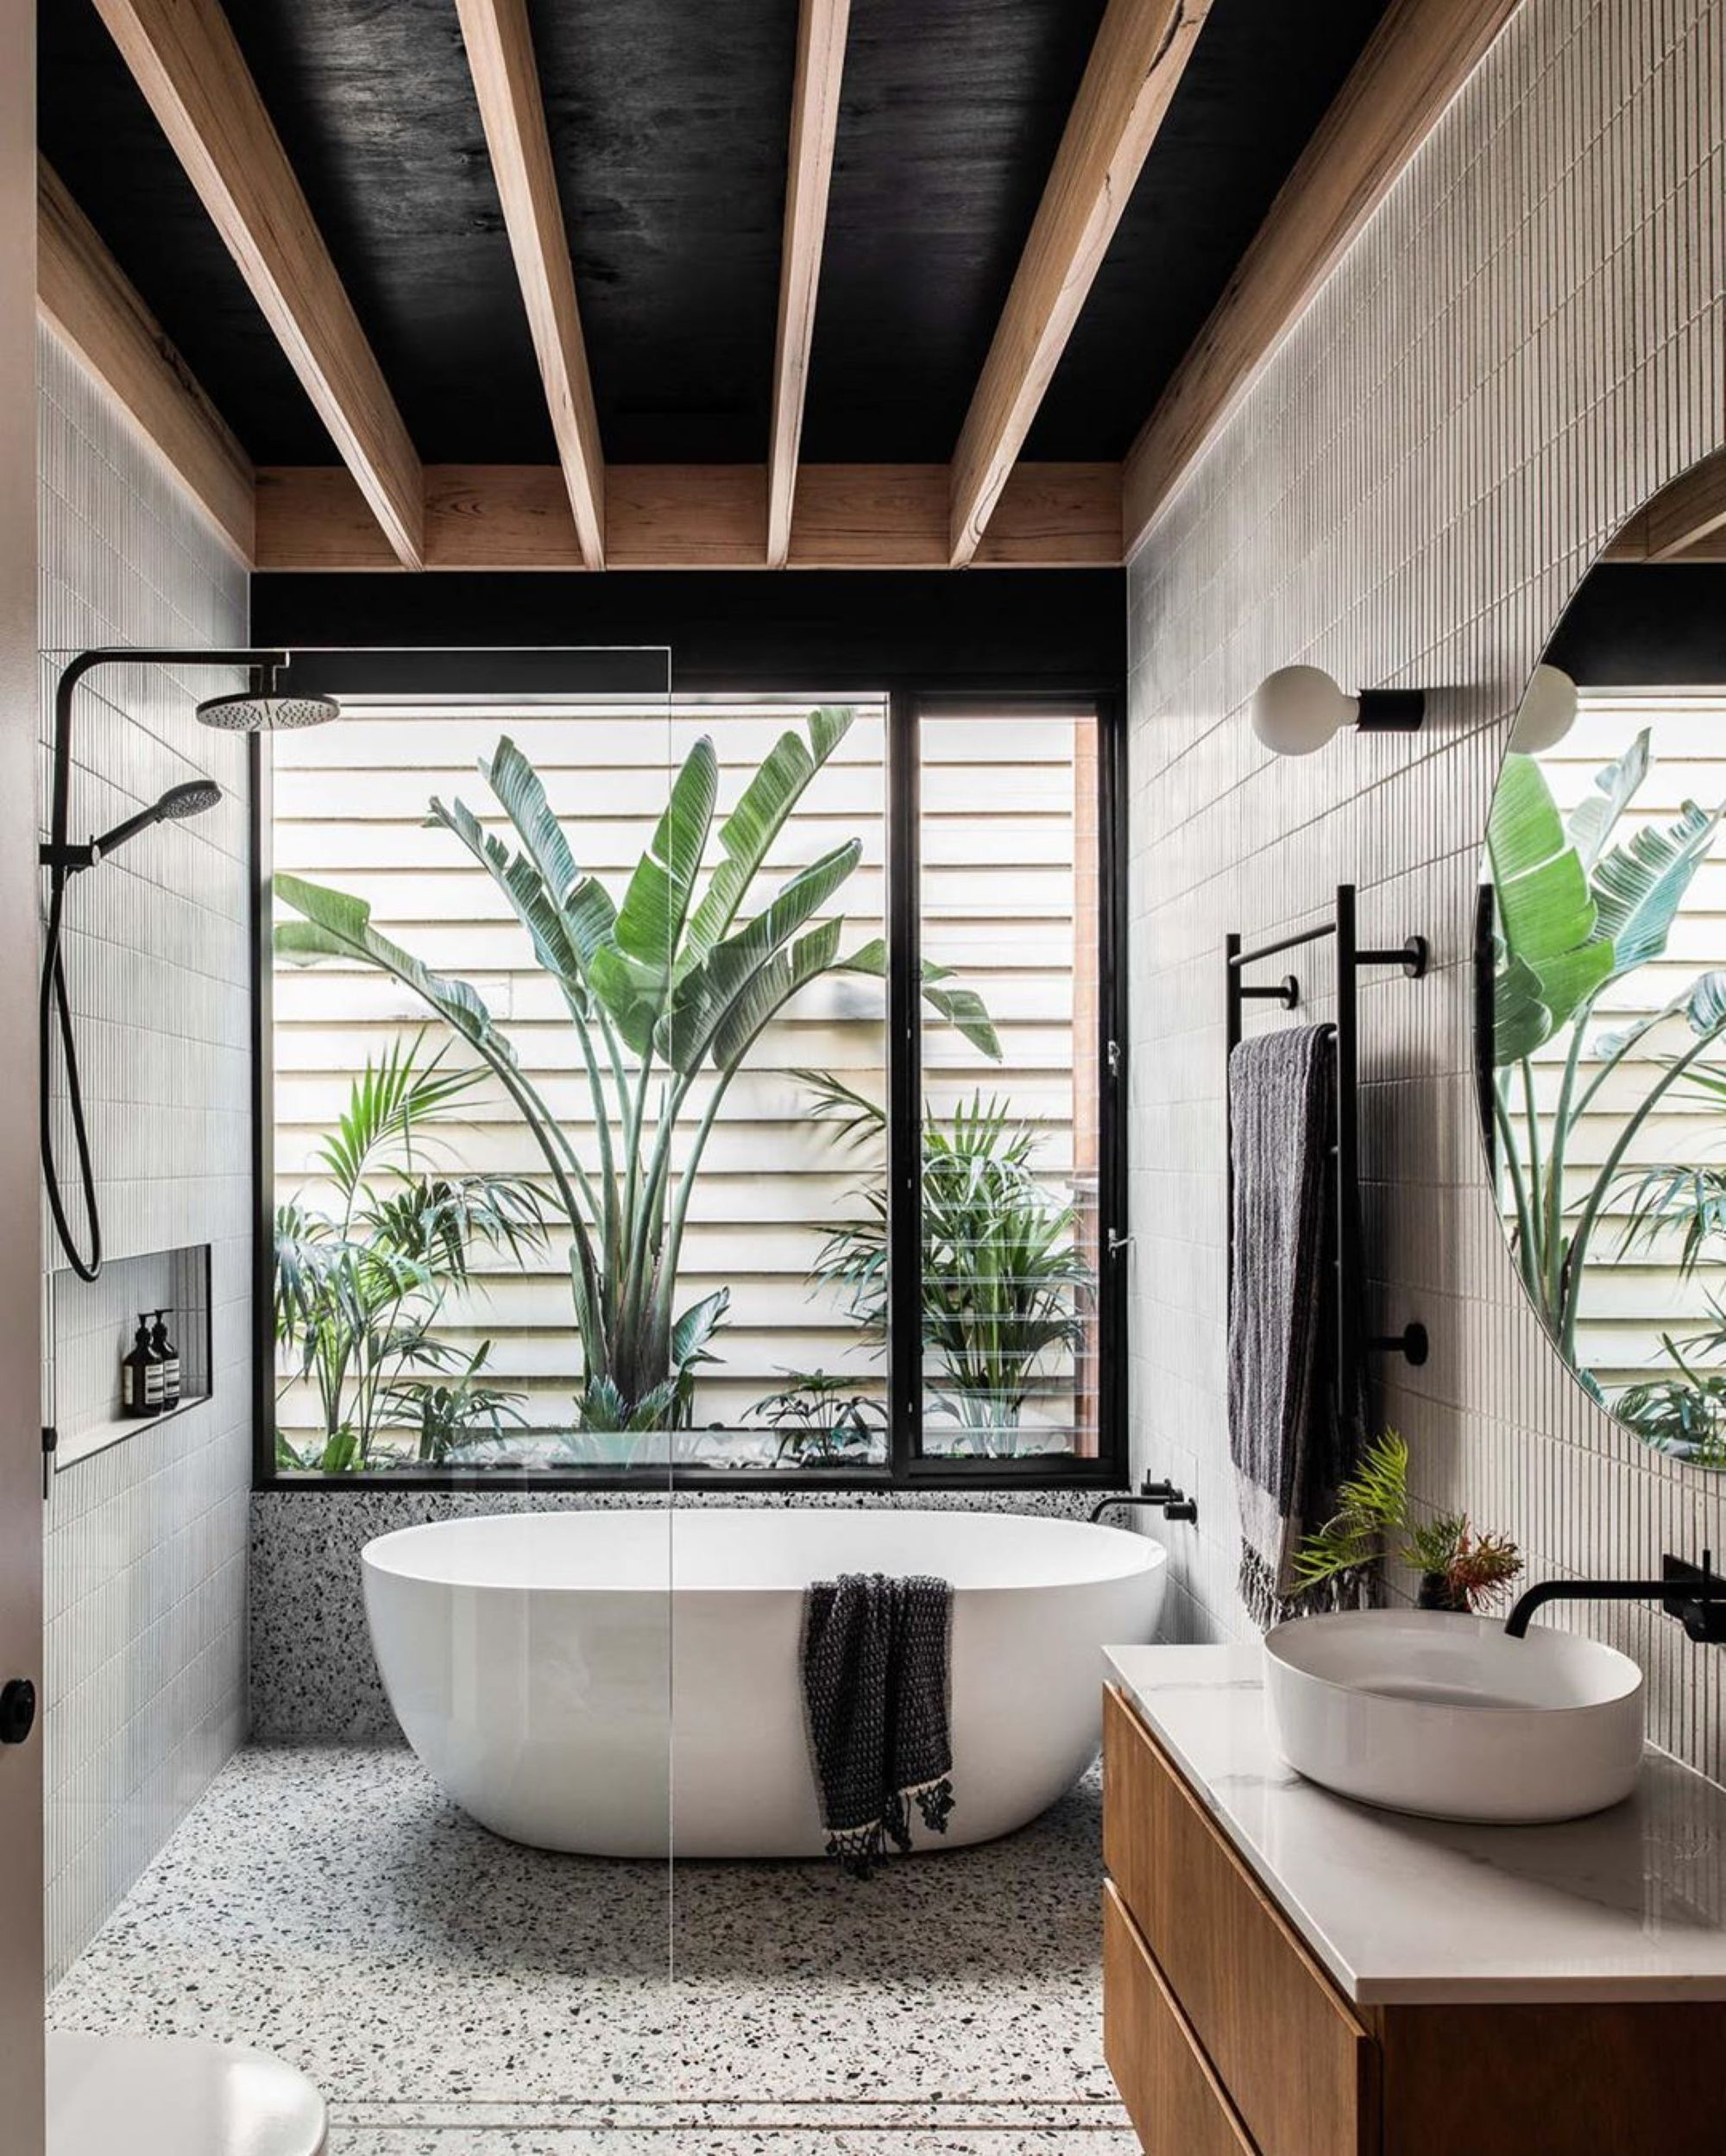 Pin On Badezimmer Aufbewahrung Caprieze fresso bathroom design